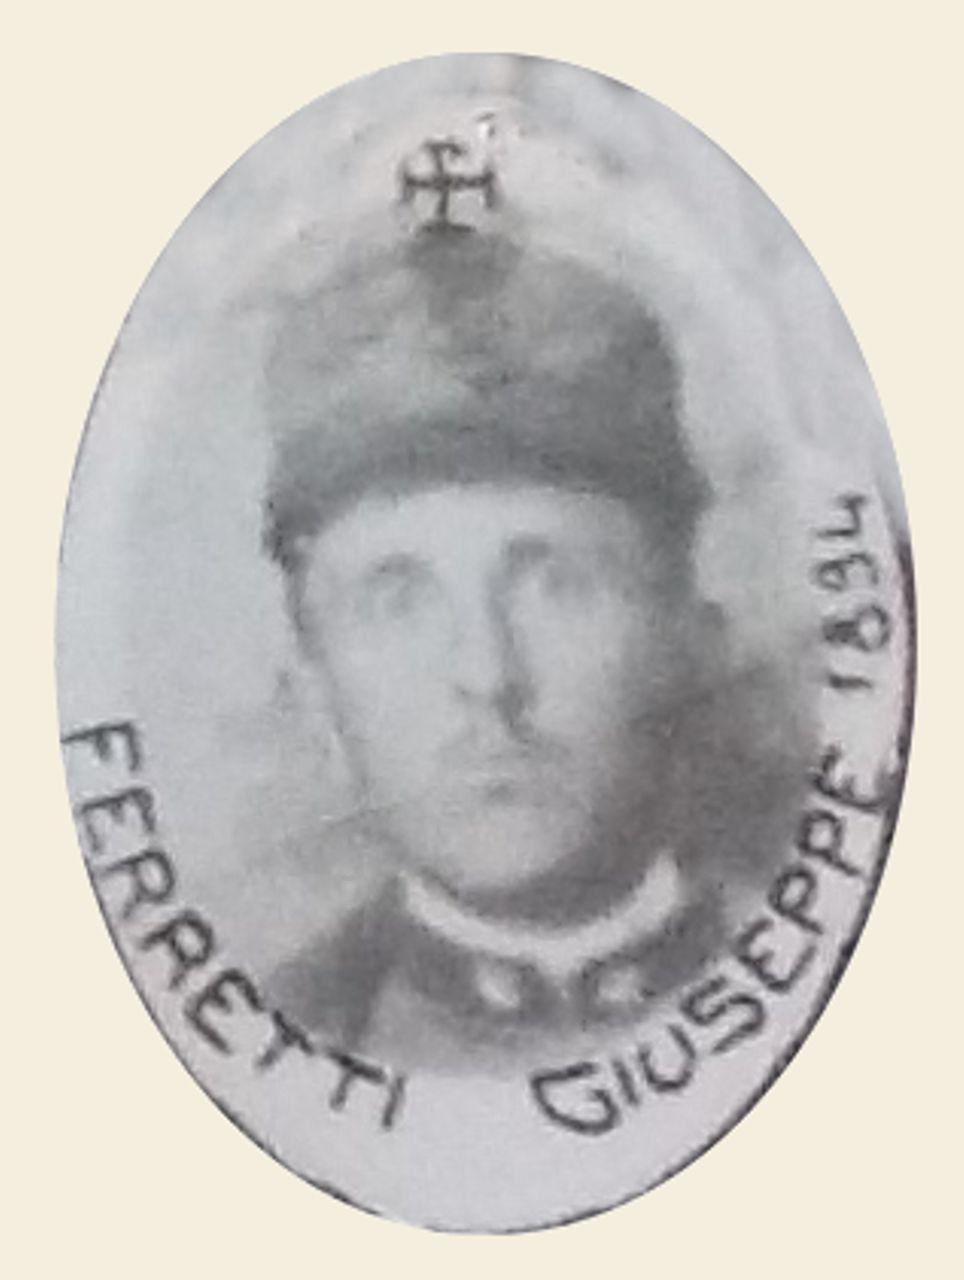 Ferretti Giuseppe